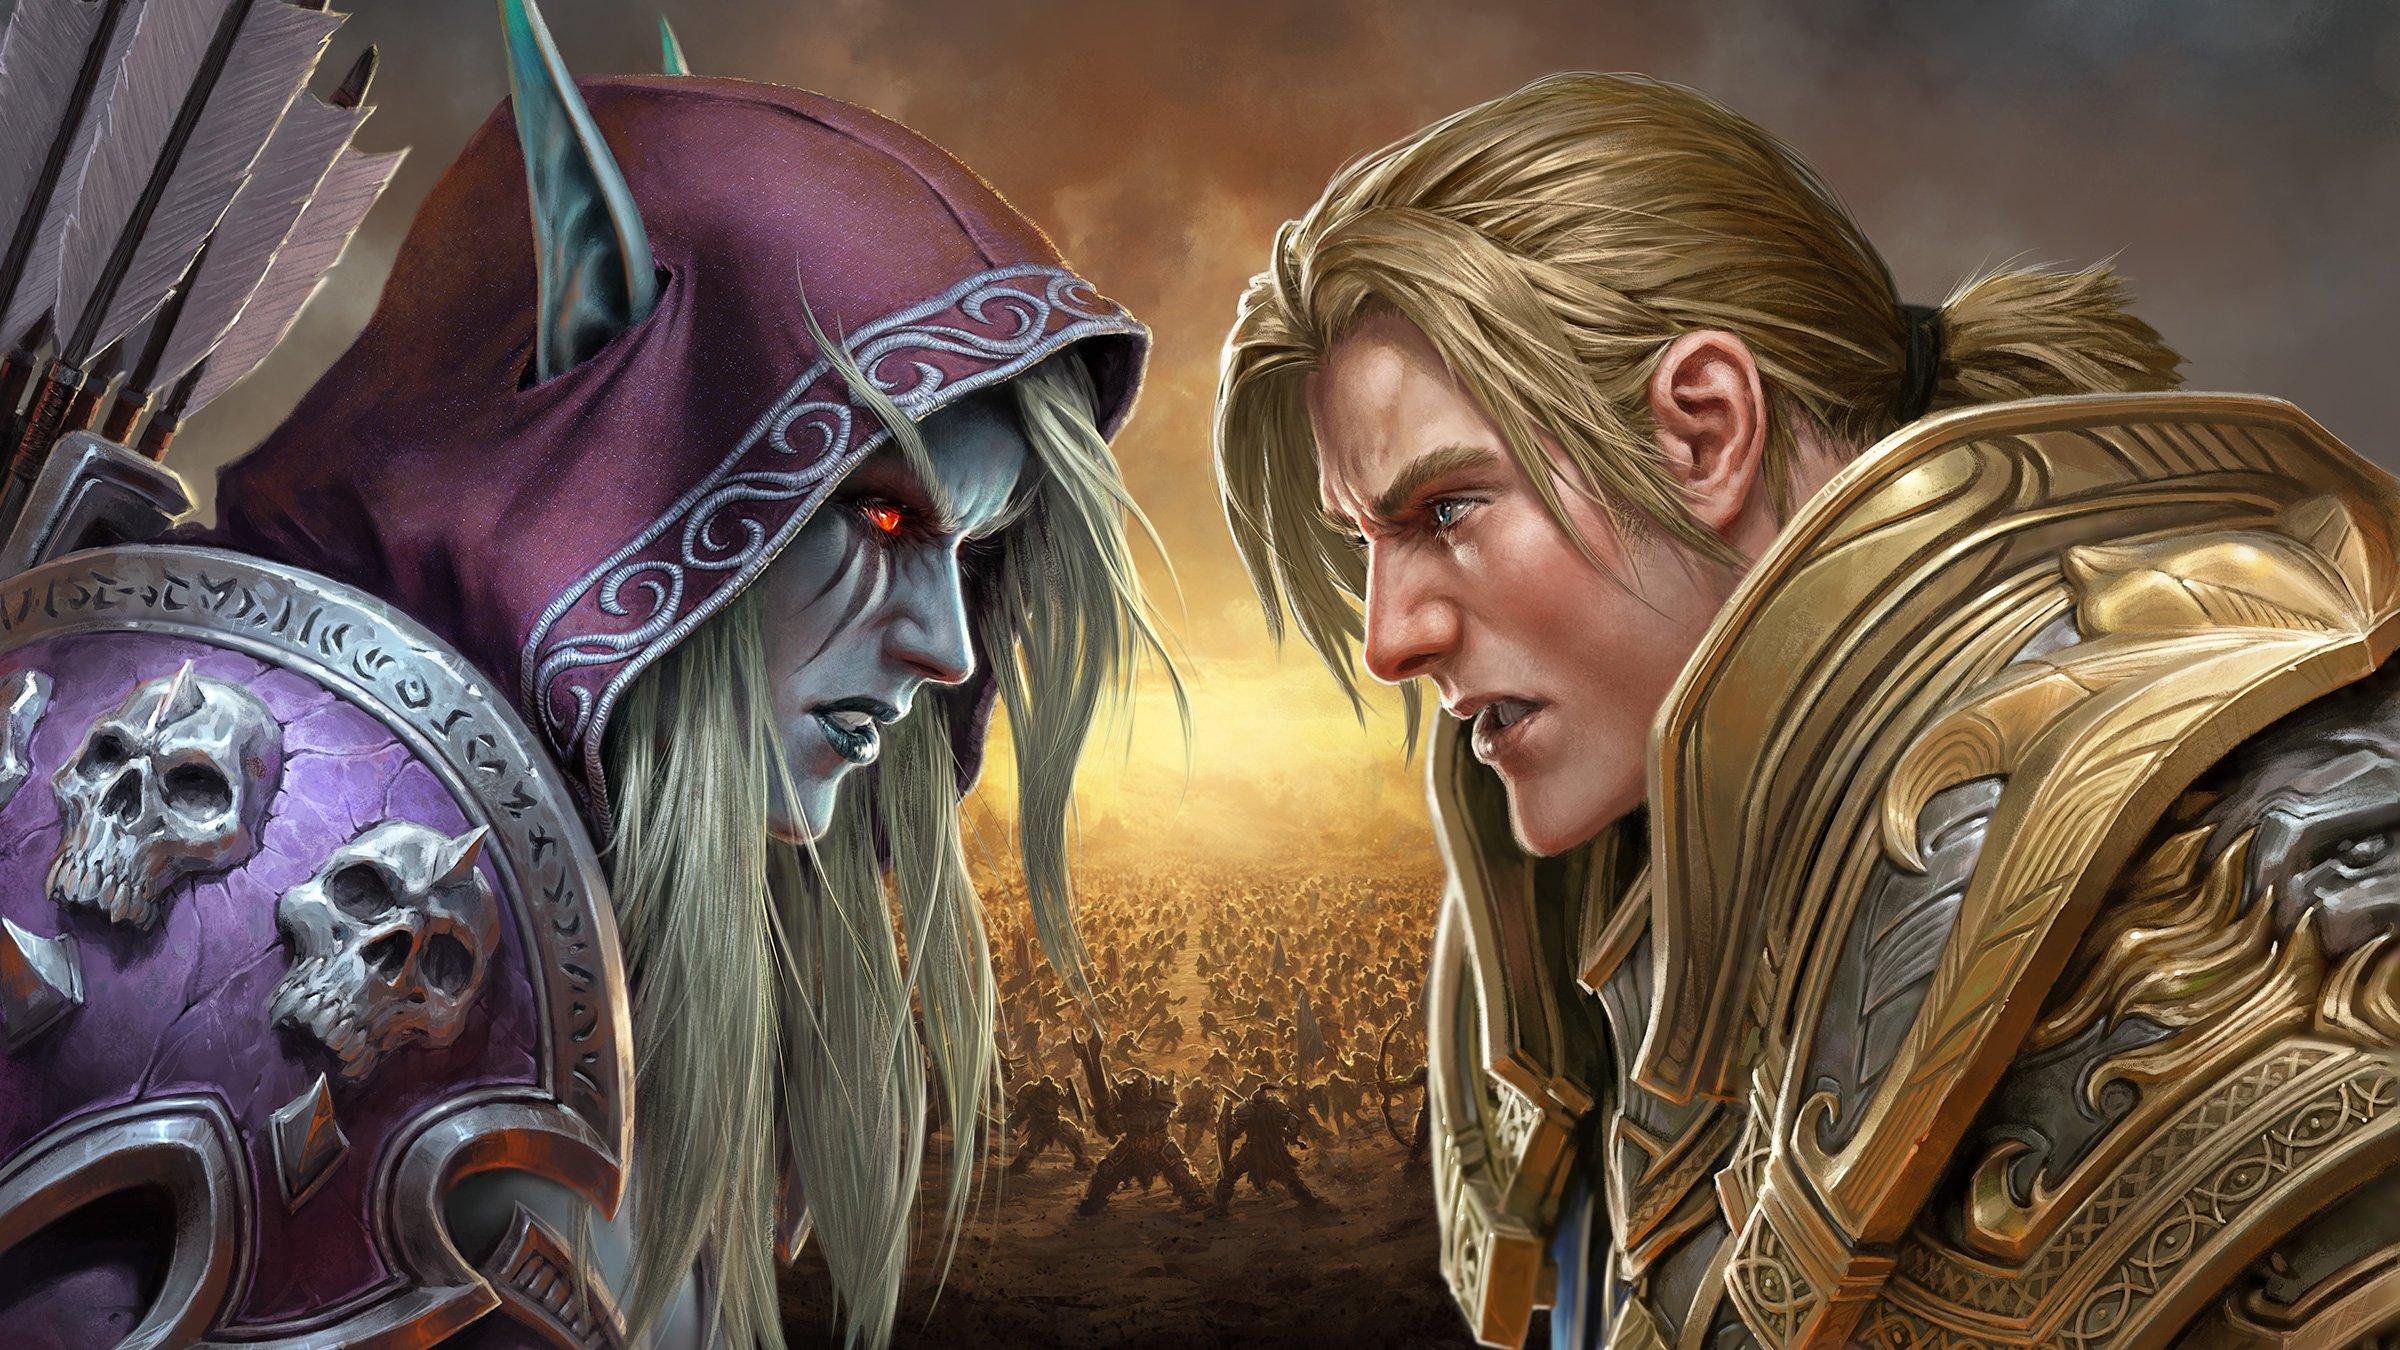 За союз! Battle for Azeroth стало самым продаваемым дополнением для WoW